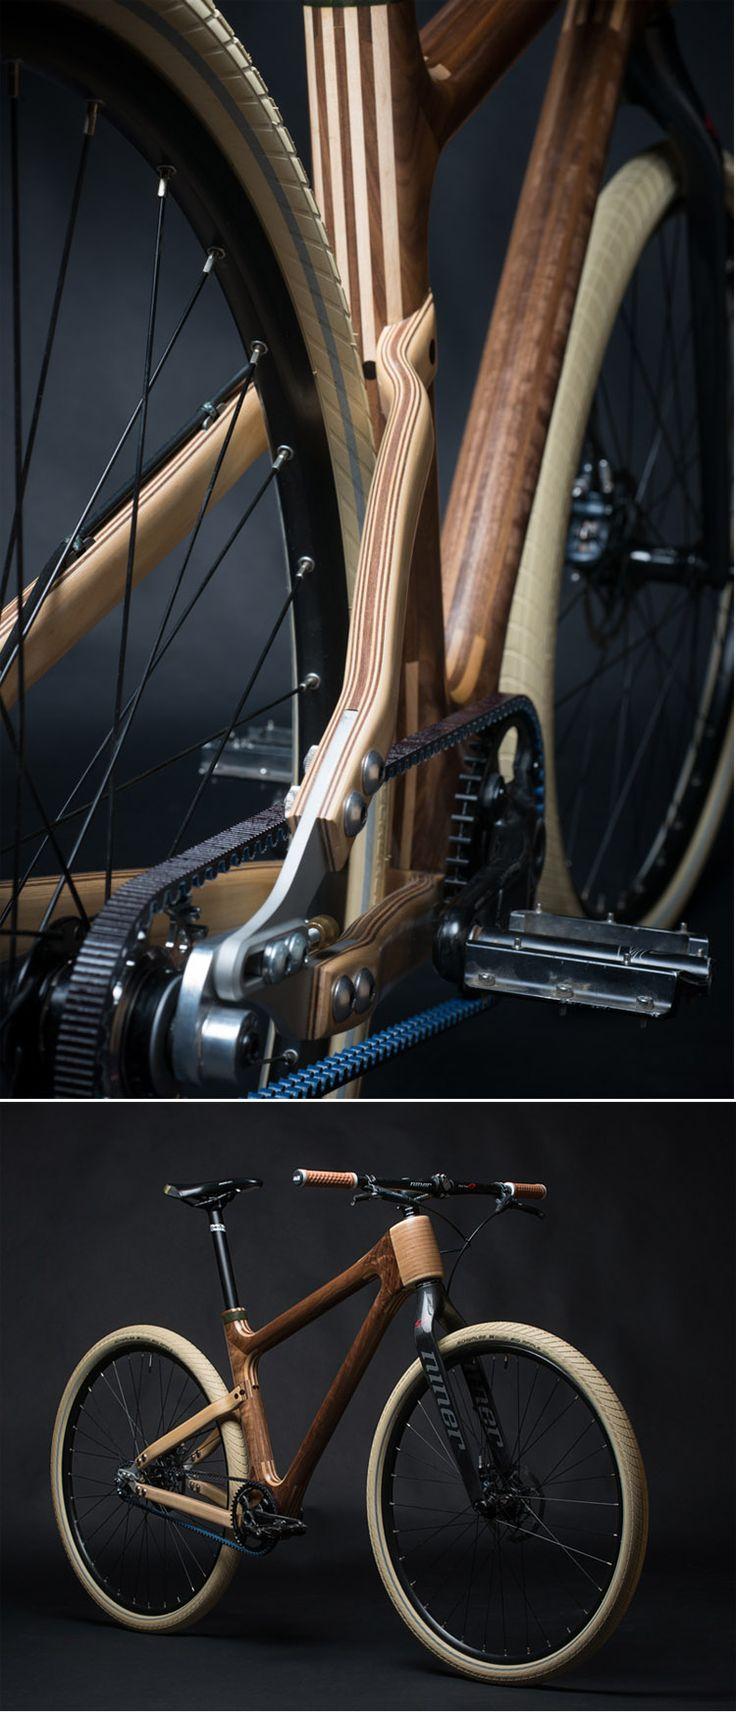 AnalogOne.One - Custom build wooden frame bike ( http://www.grainworkswoodart.com/shop/analogoneone-custom-build )